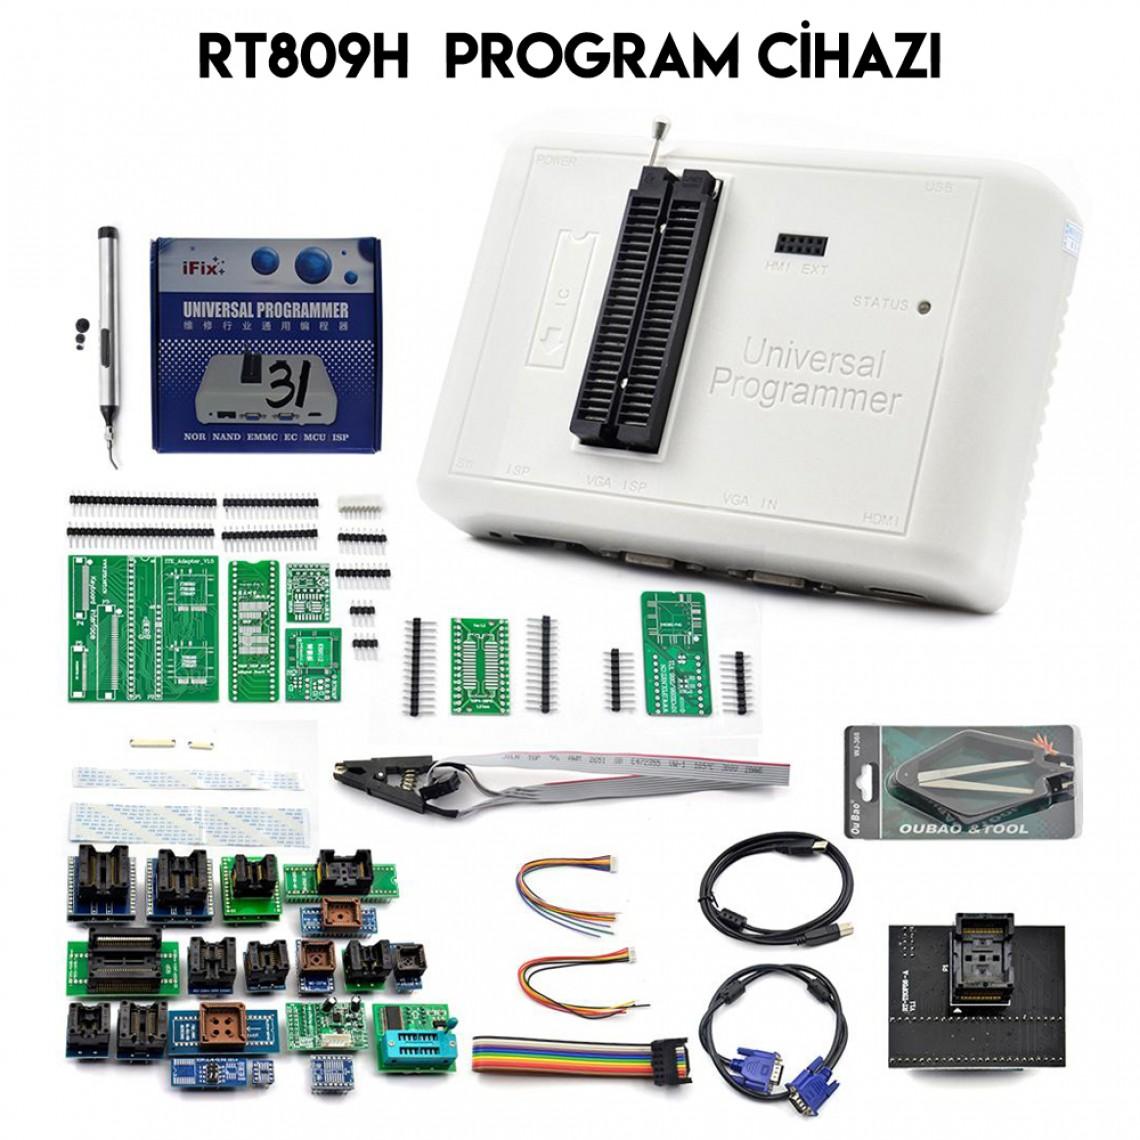 RT809H, Universal Programmer, eMMC, Nand, Spi, Eprom, Mcu, Bios, Program Cihazı